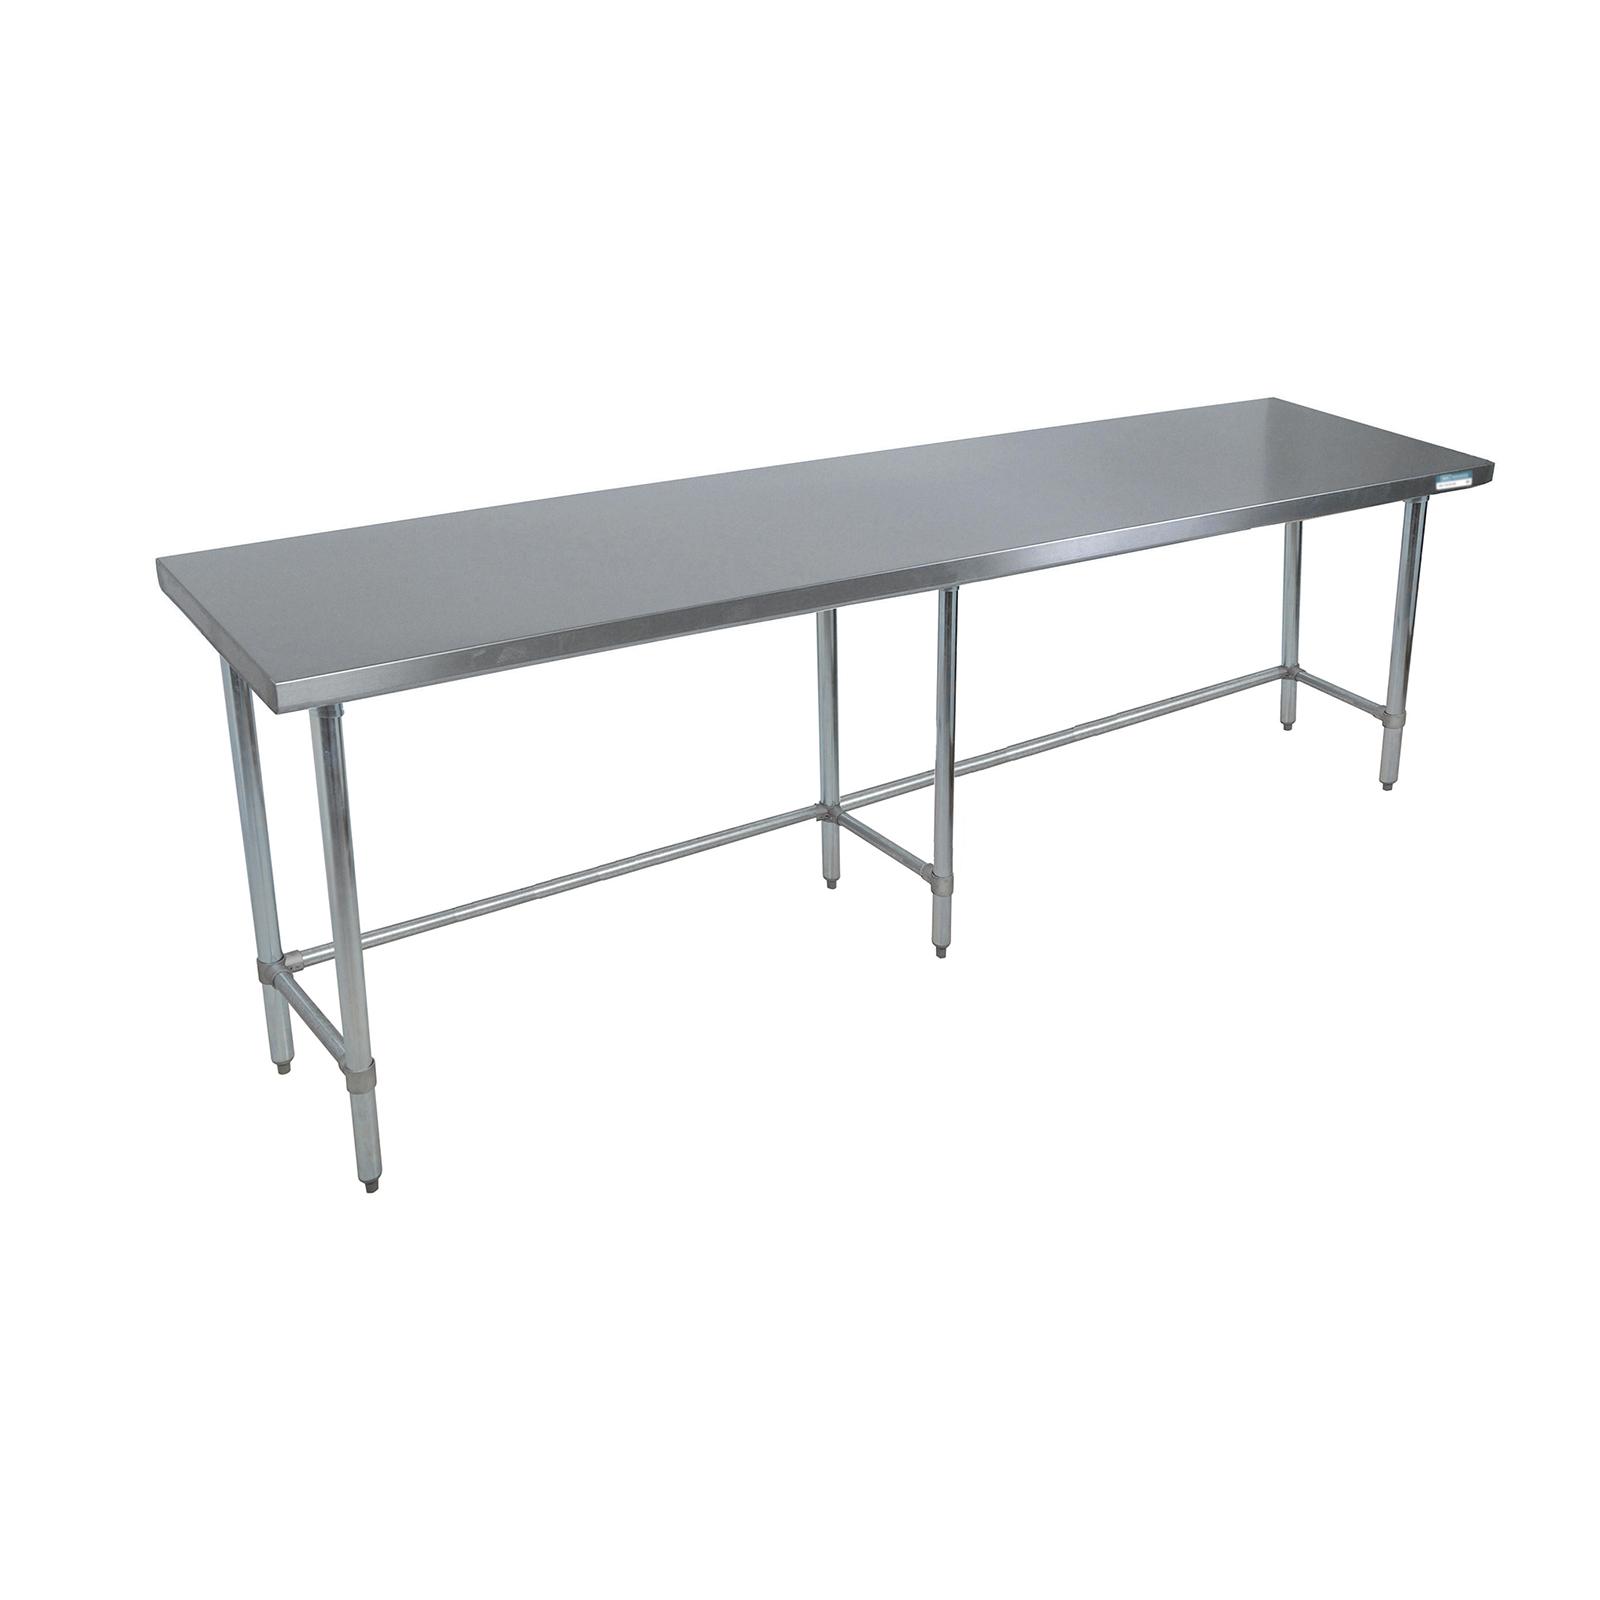 BK Resources VTTOB-9630 work table,  85